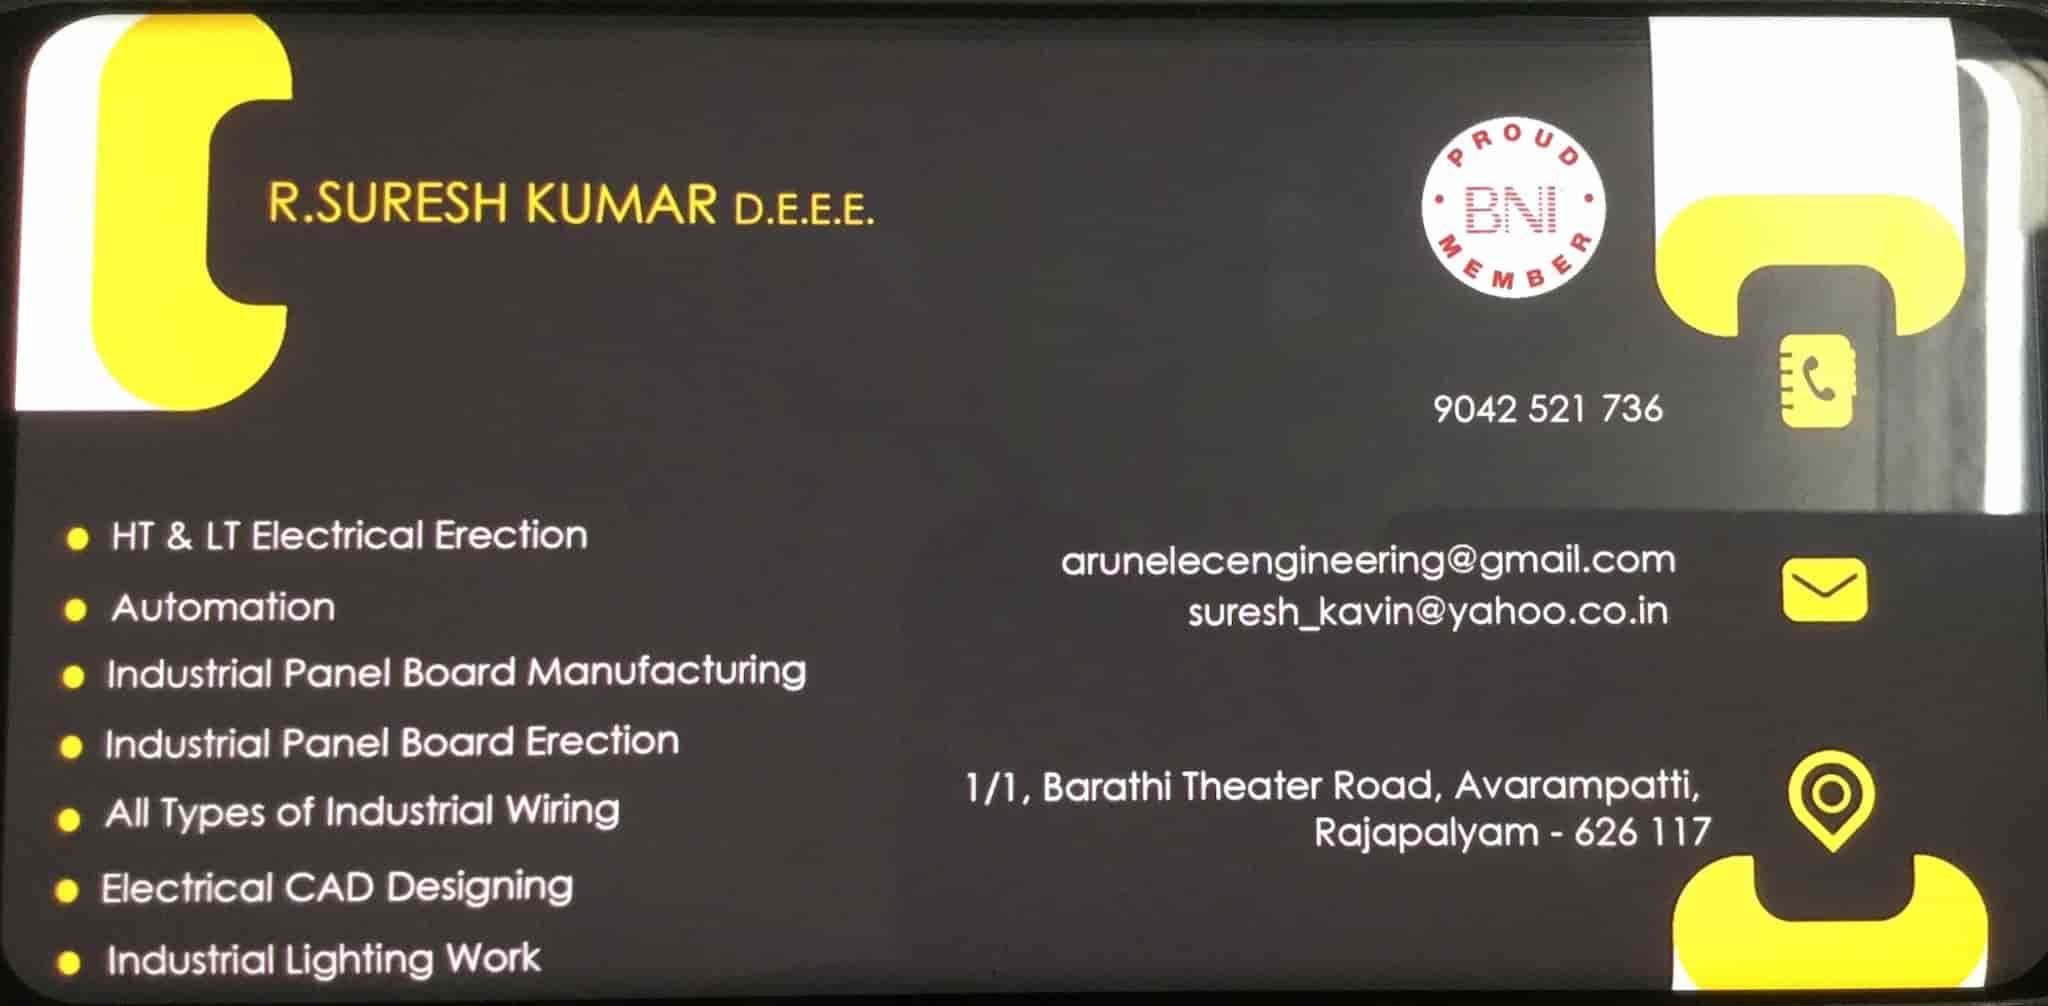 Arun Electric Engineering, Rajapalayam - AC Capacitor Dealers in